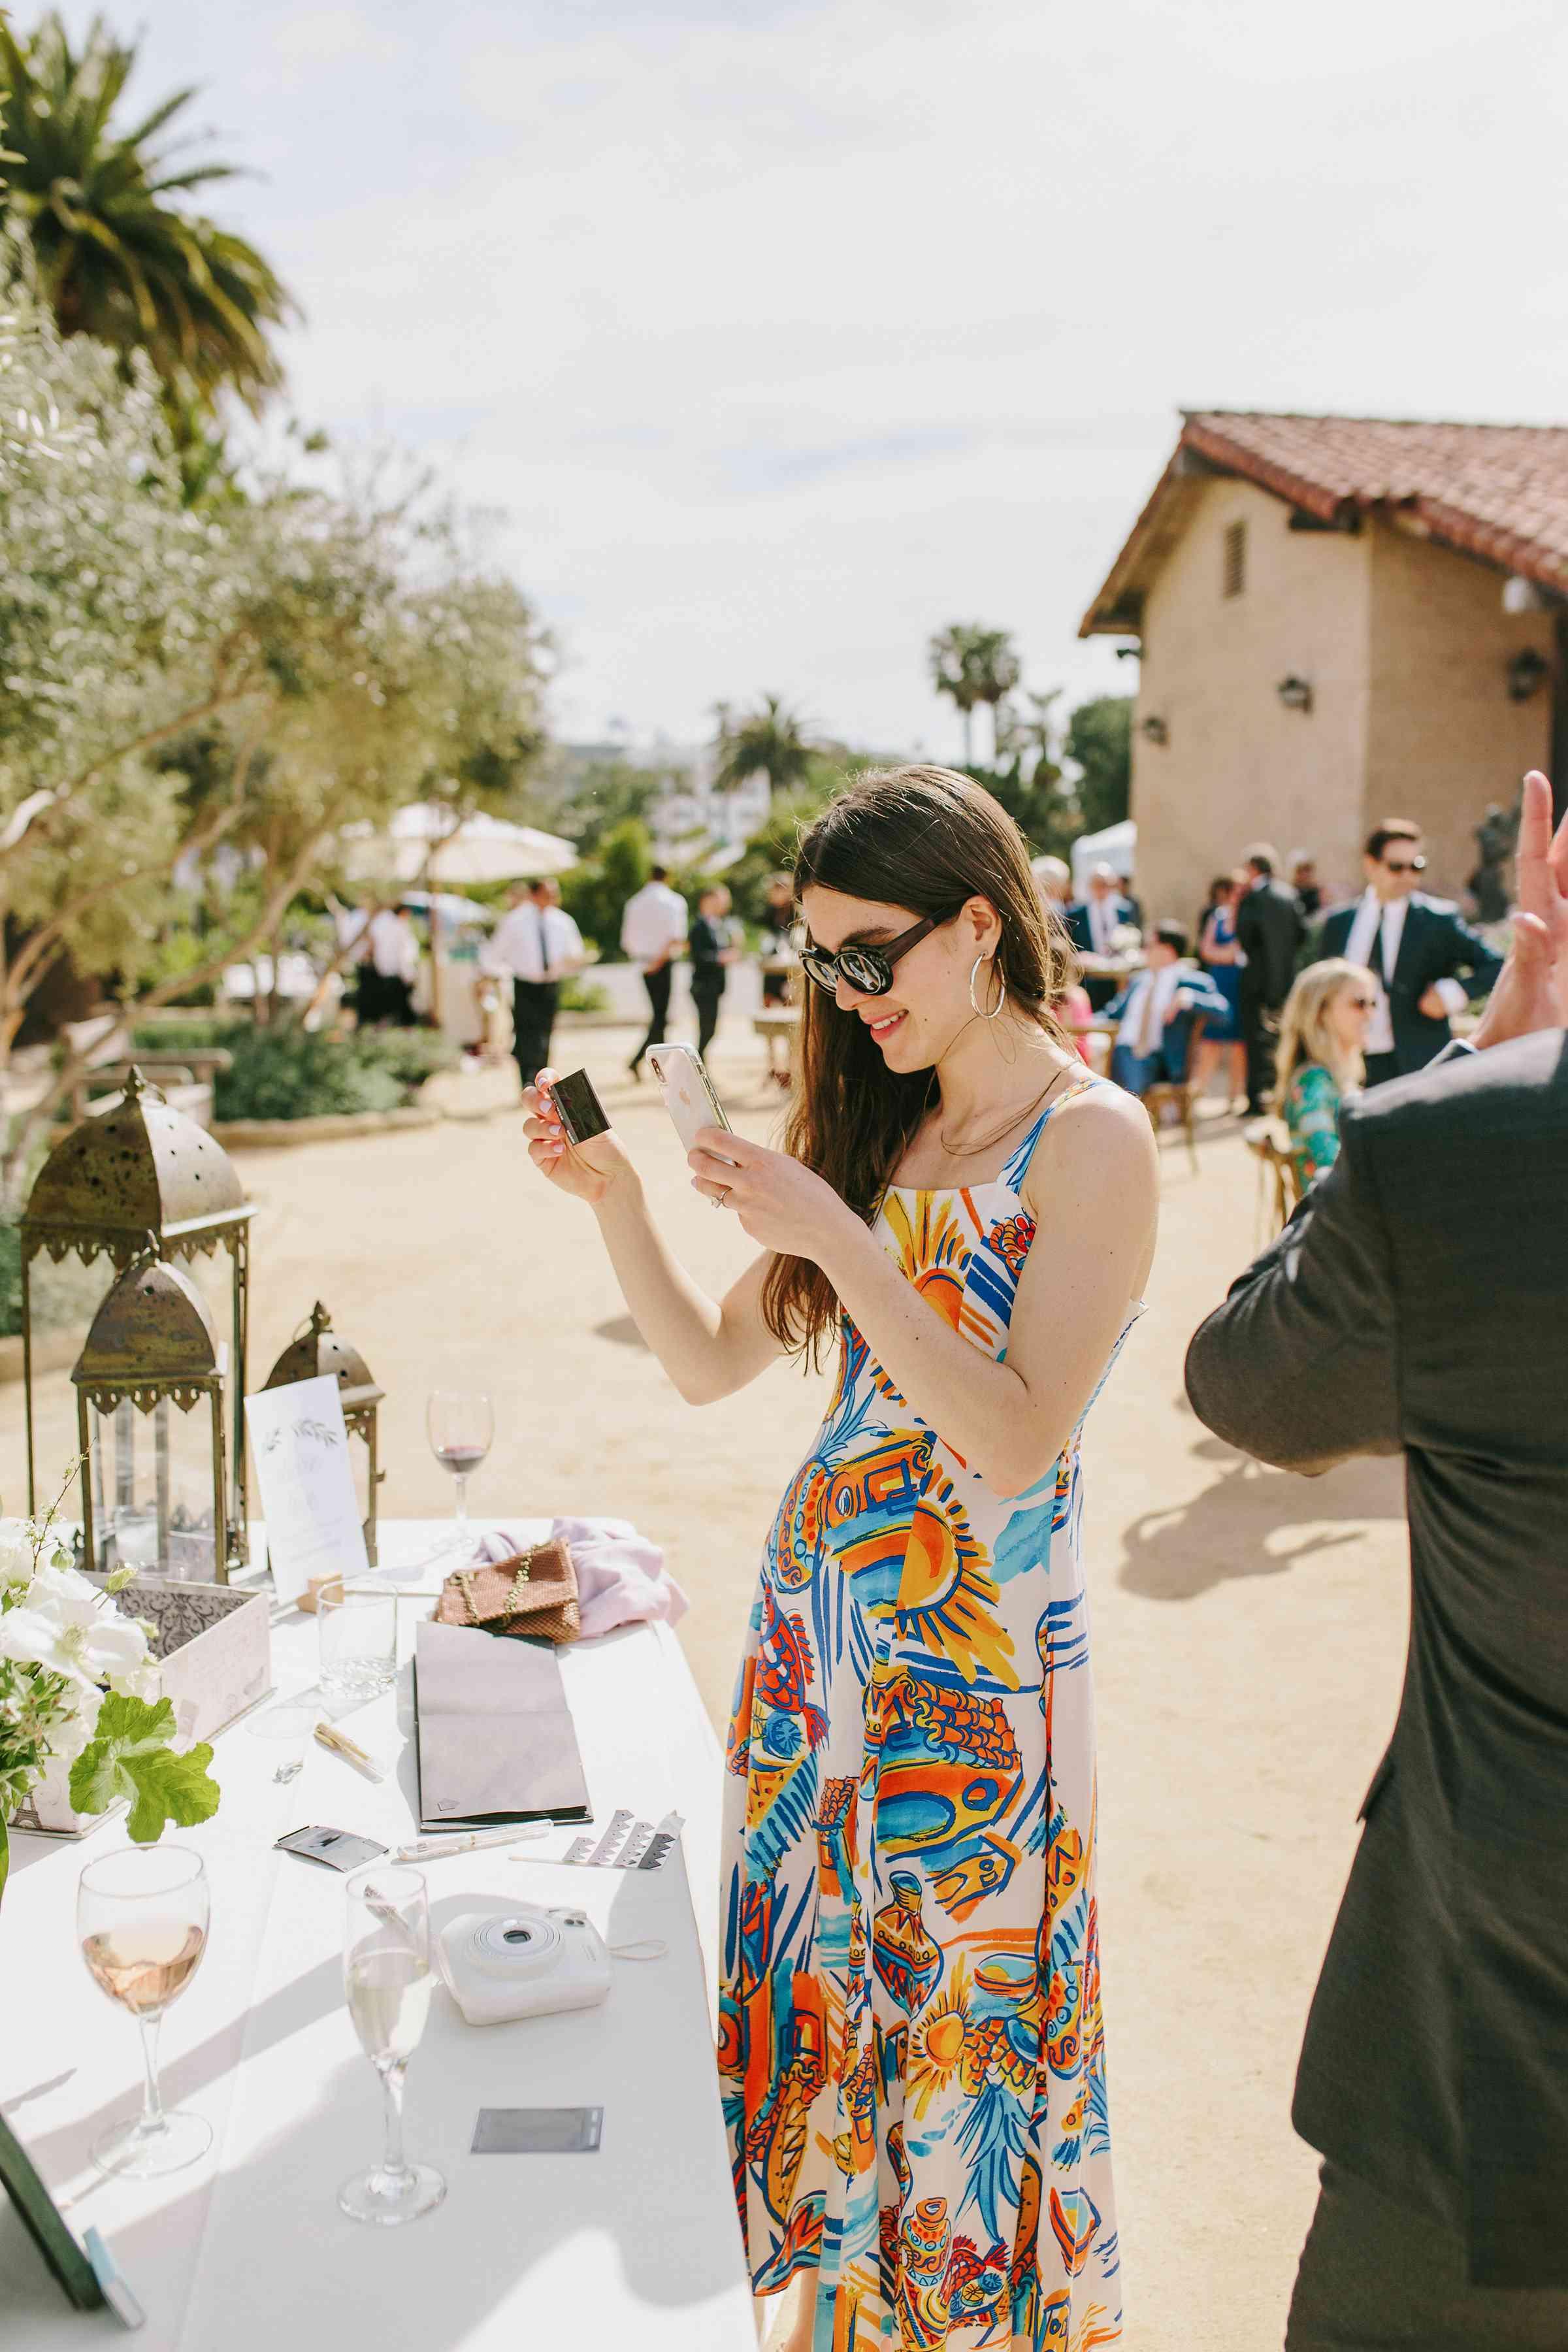 <p>guests taking polaroids</p><br><br>